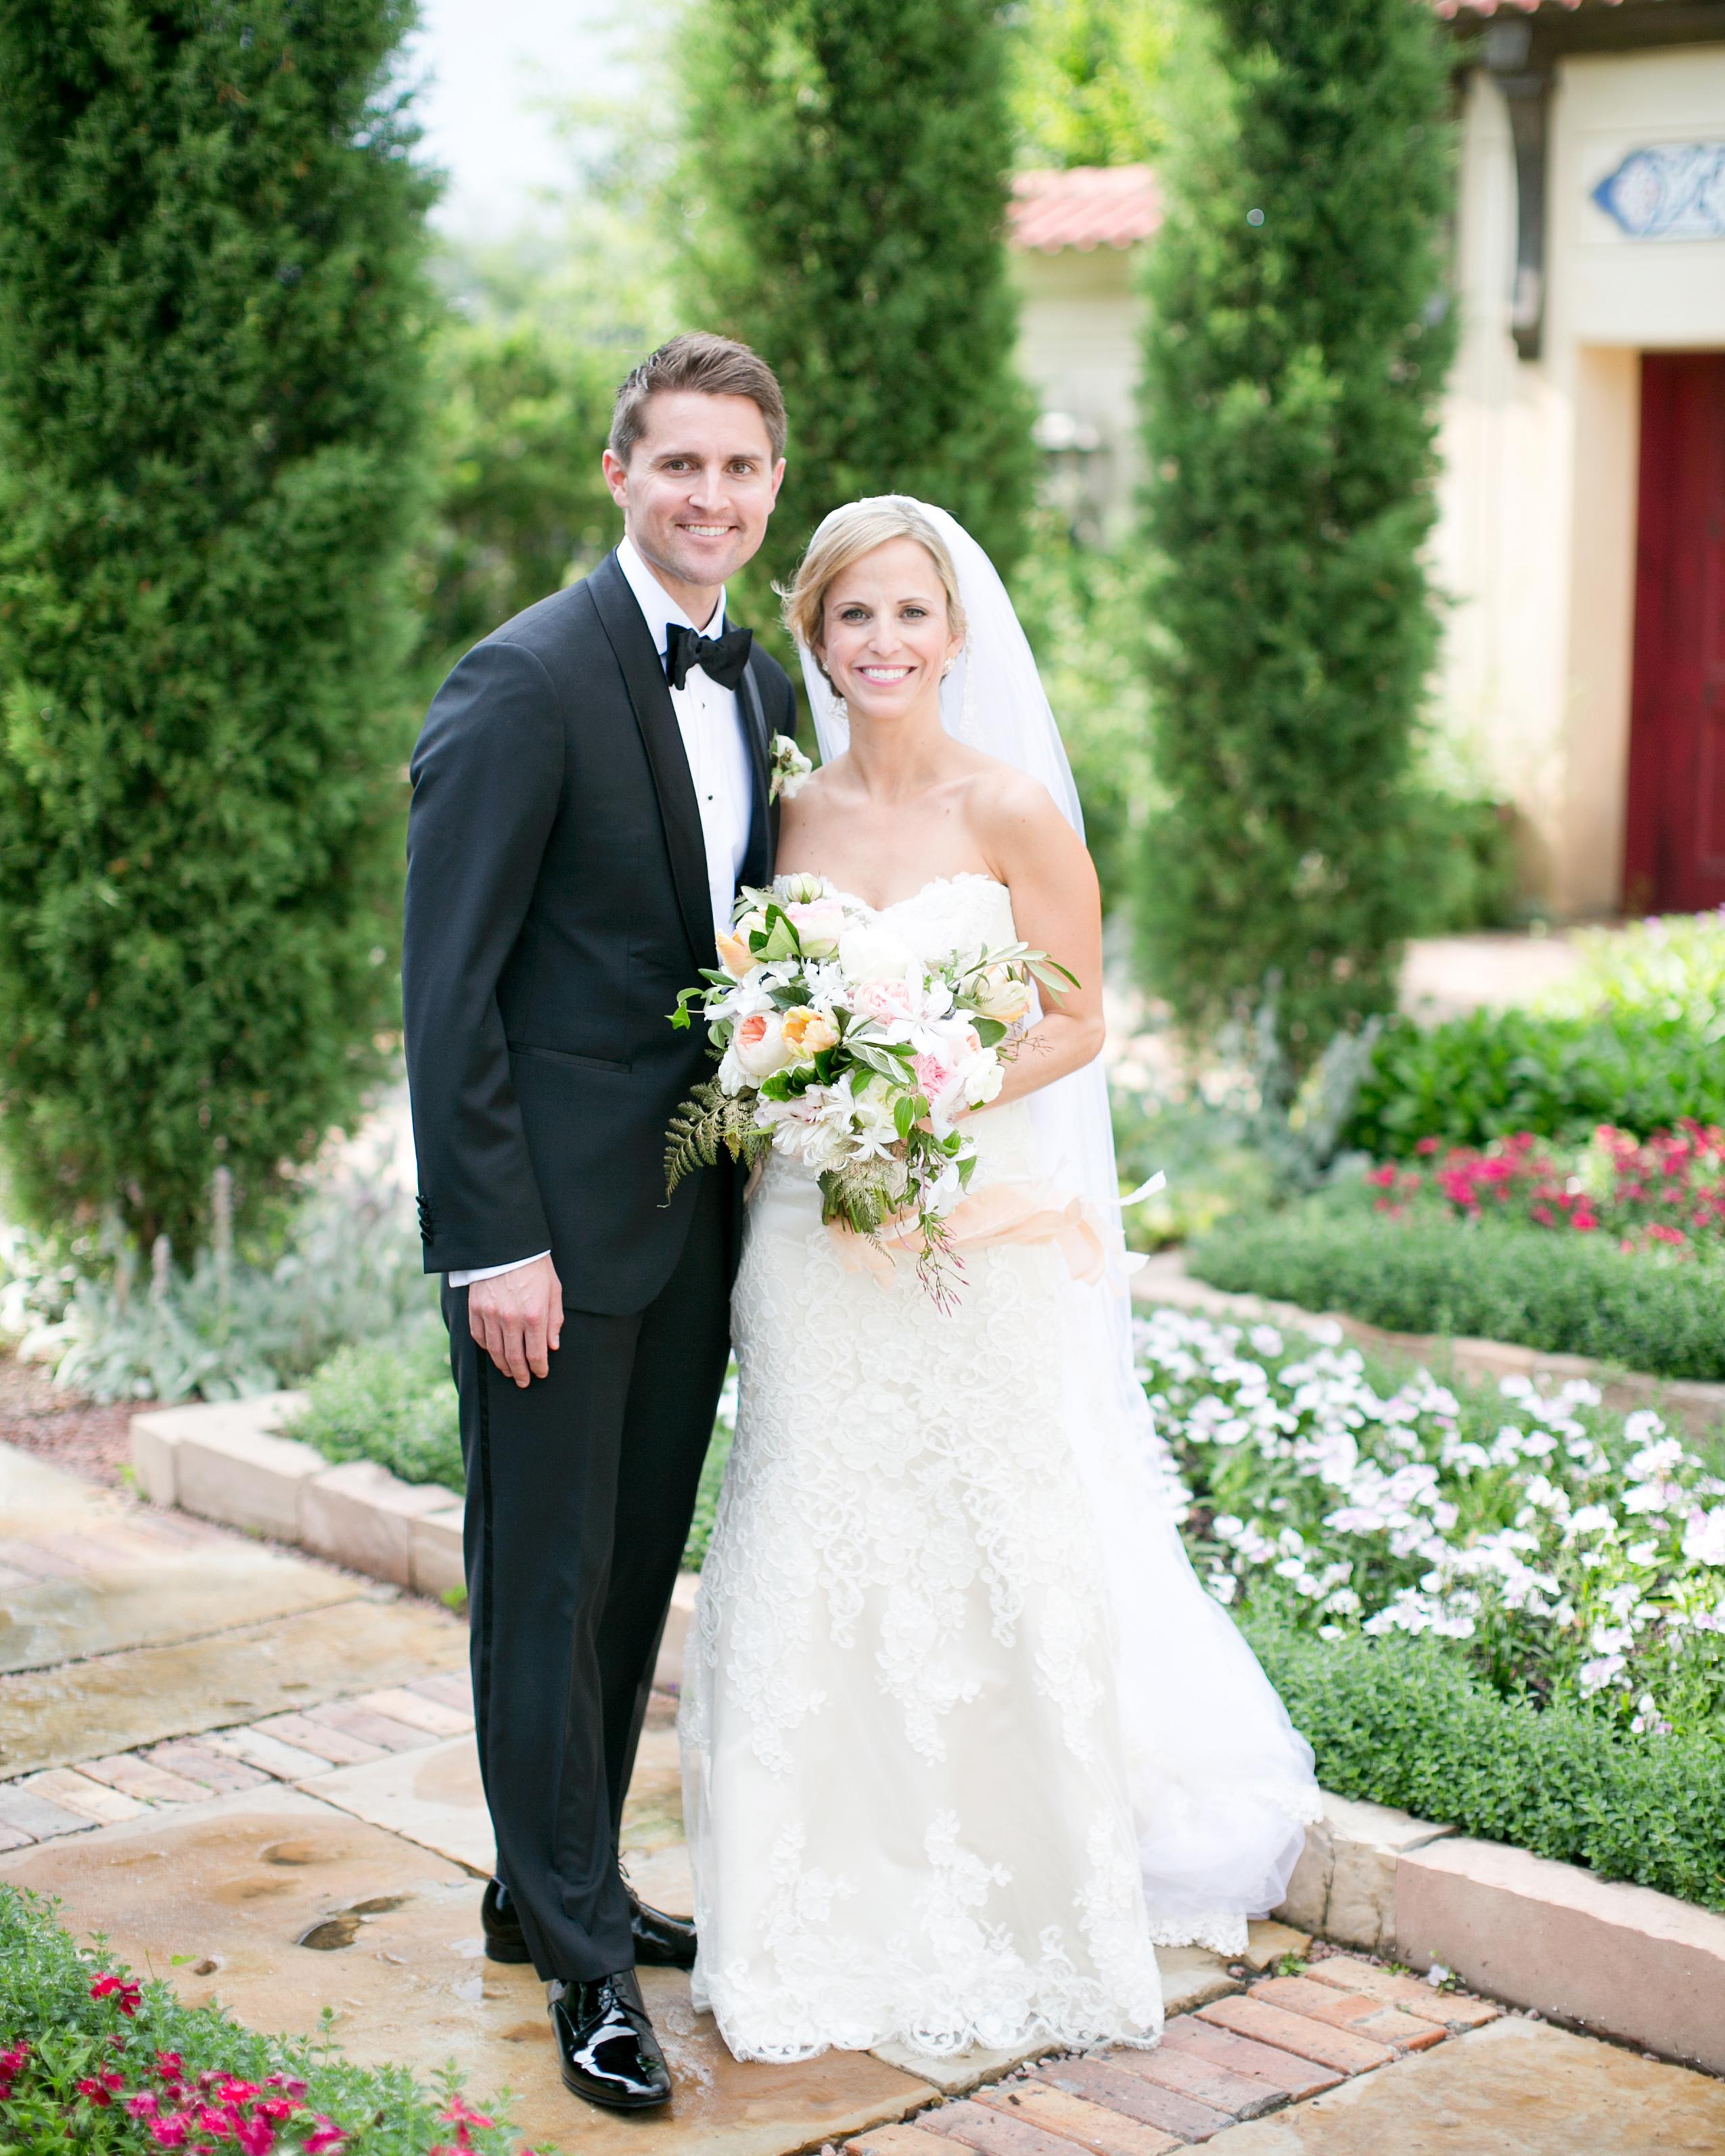 courtney-michael-wedding-07-s111677-0215.jpg